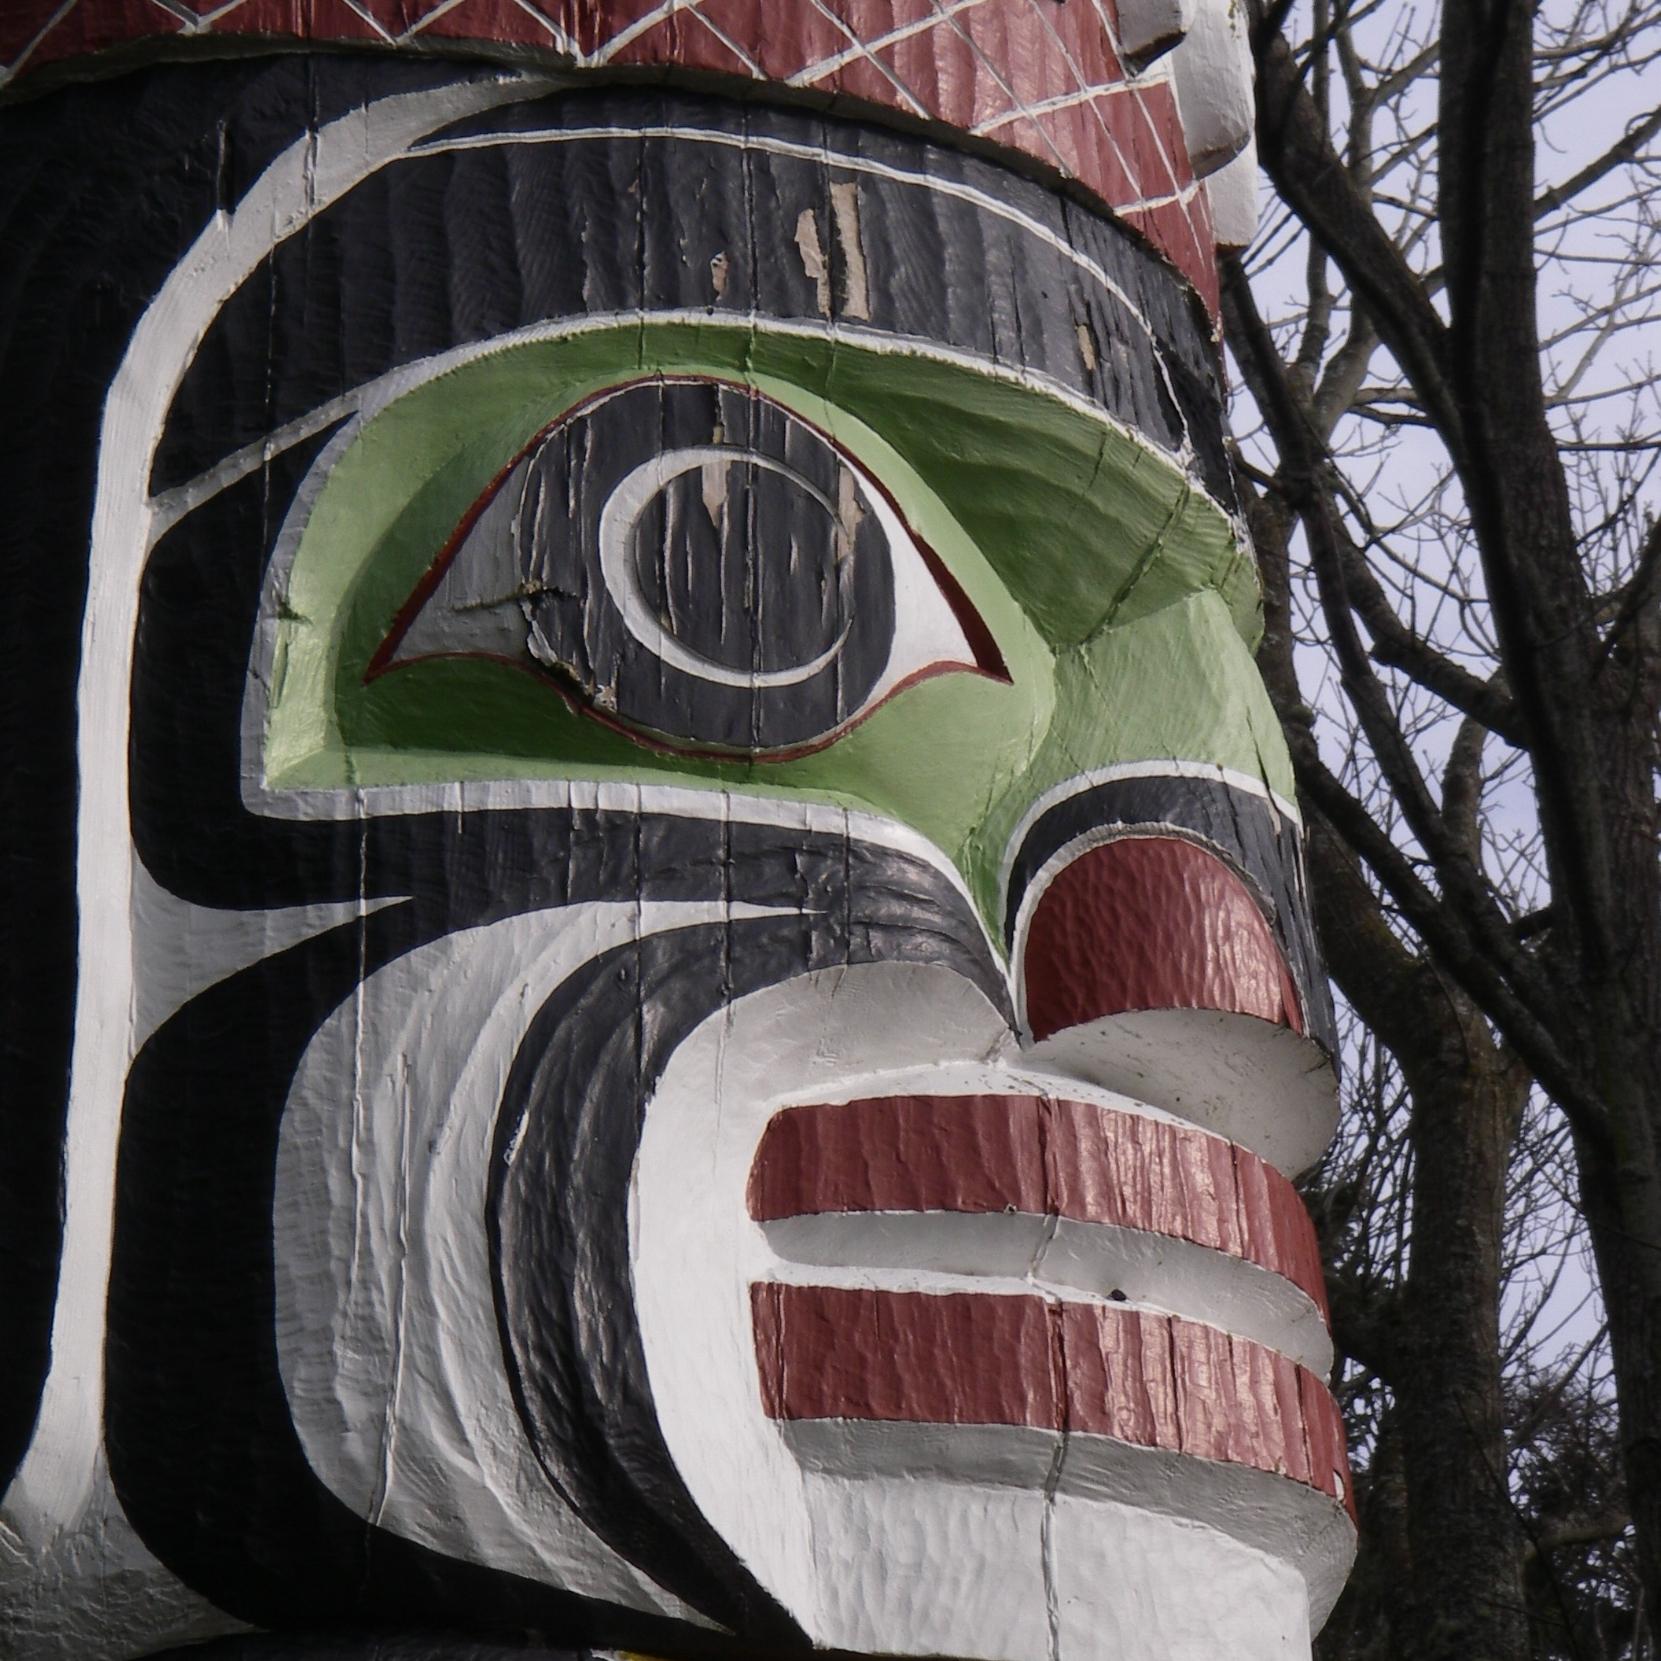 Nygren, Susan - Totem Pole at Beacon Hill Park.JPG